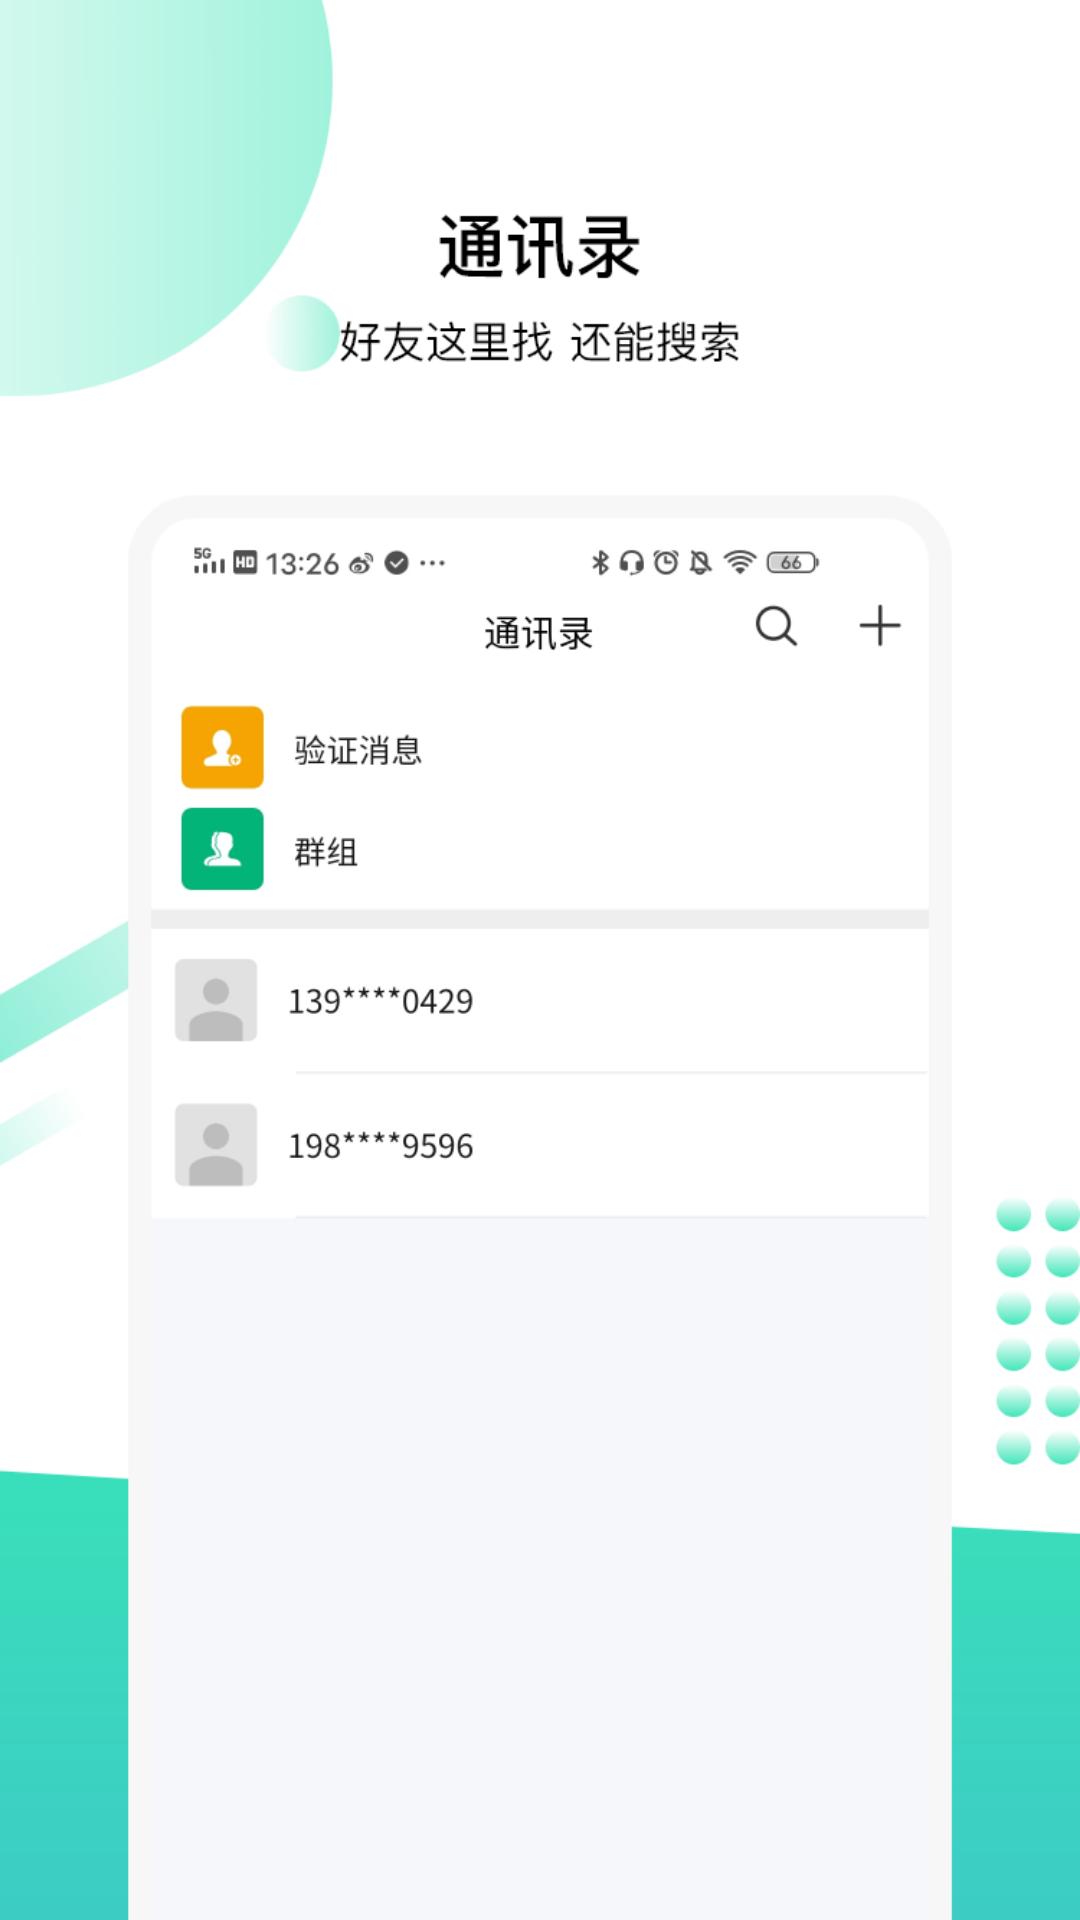 蜂讯交友ap<a href=https://www.babapi.com/zhuanti/ppicture target=_blank class=infotextkey>p图</a>片1